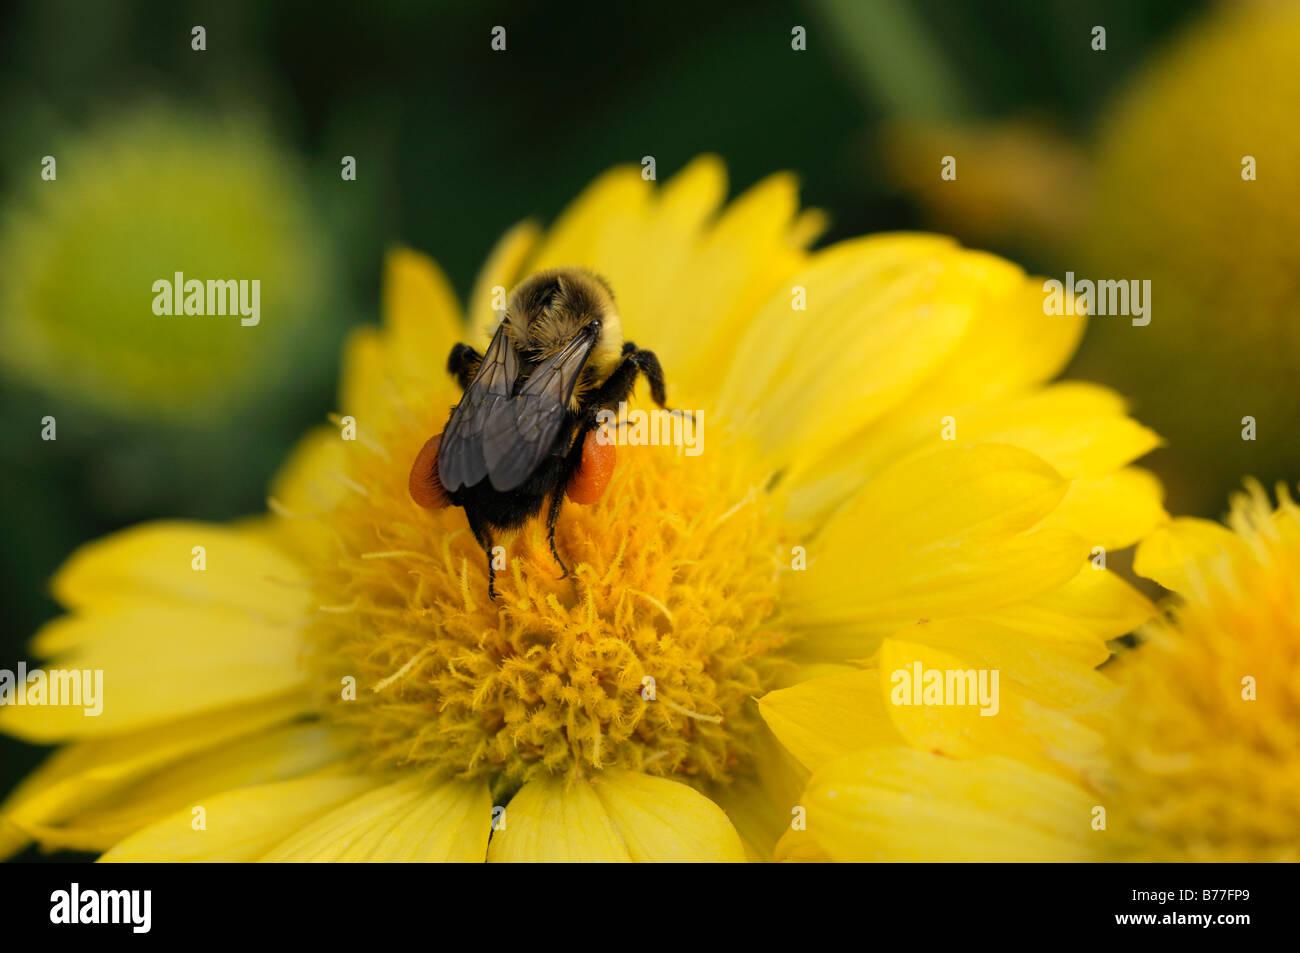 gaillardia x grandiflora yellow bee feeding collecting clooect sip nectar pollinate pollination flower bloom blossom - Stock Image